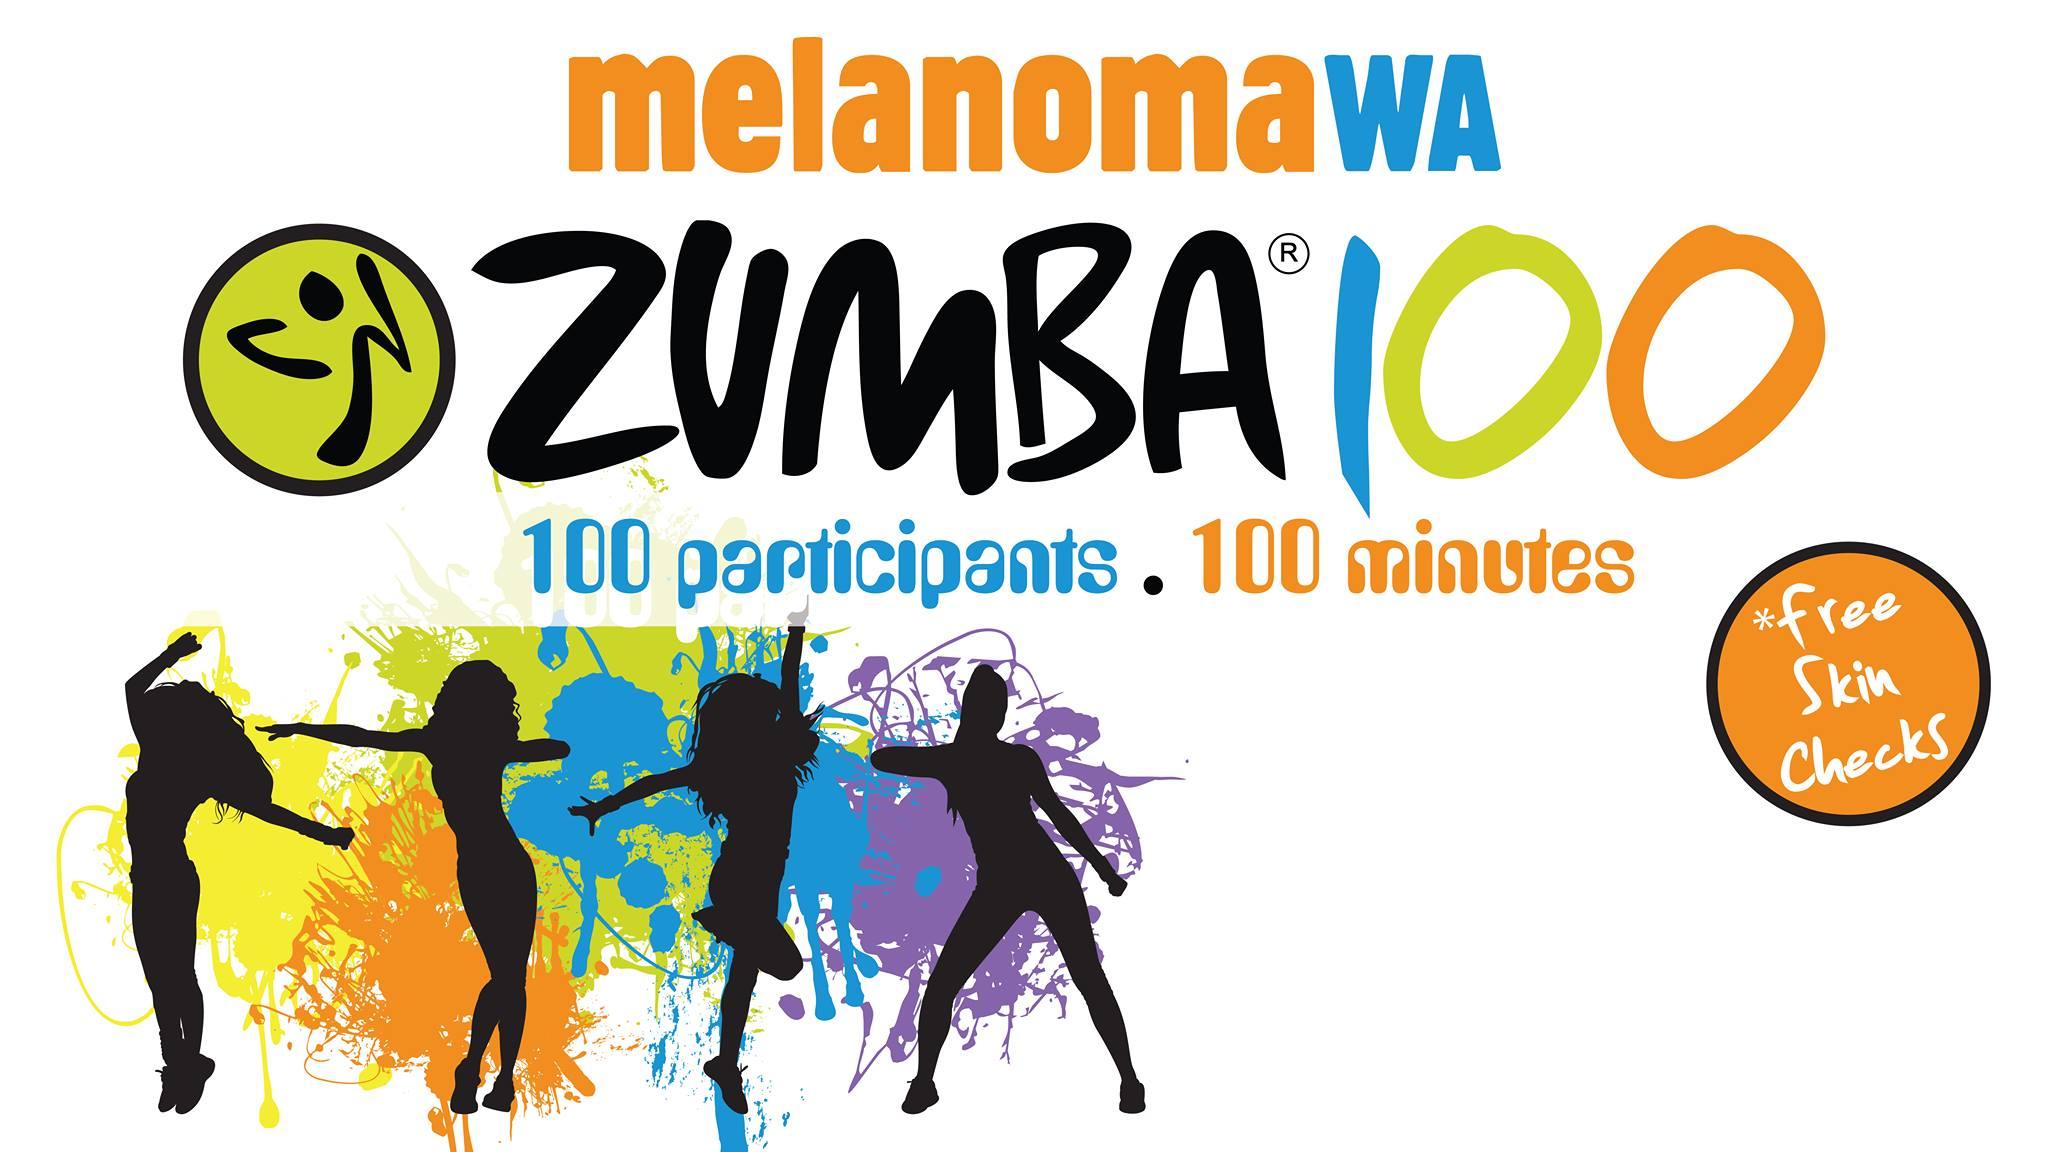 Zumba100 for melanomaWA